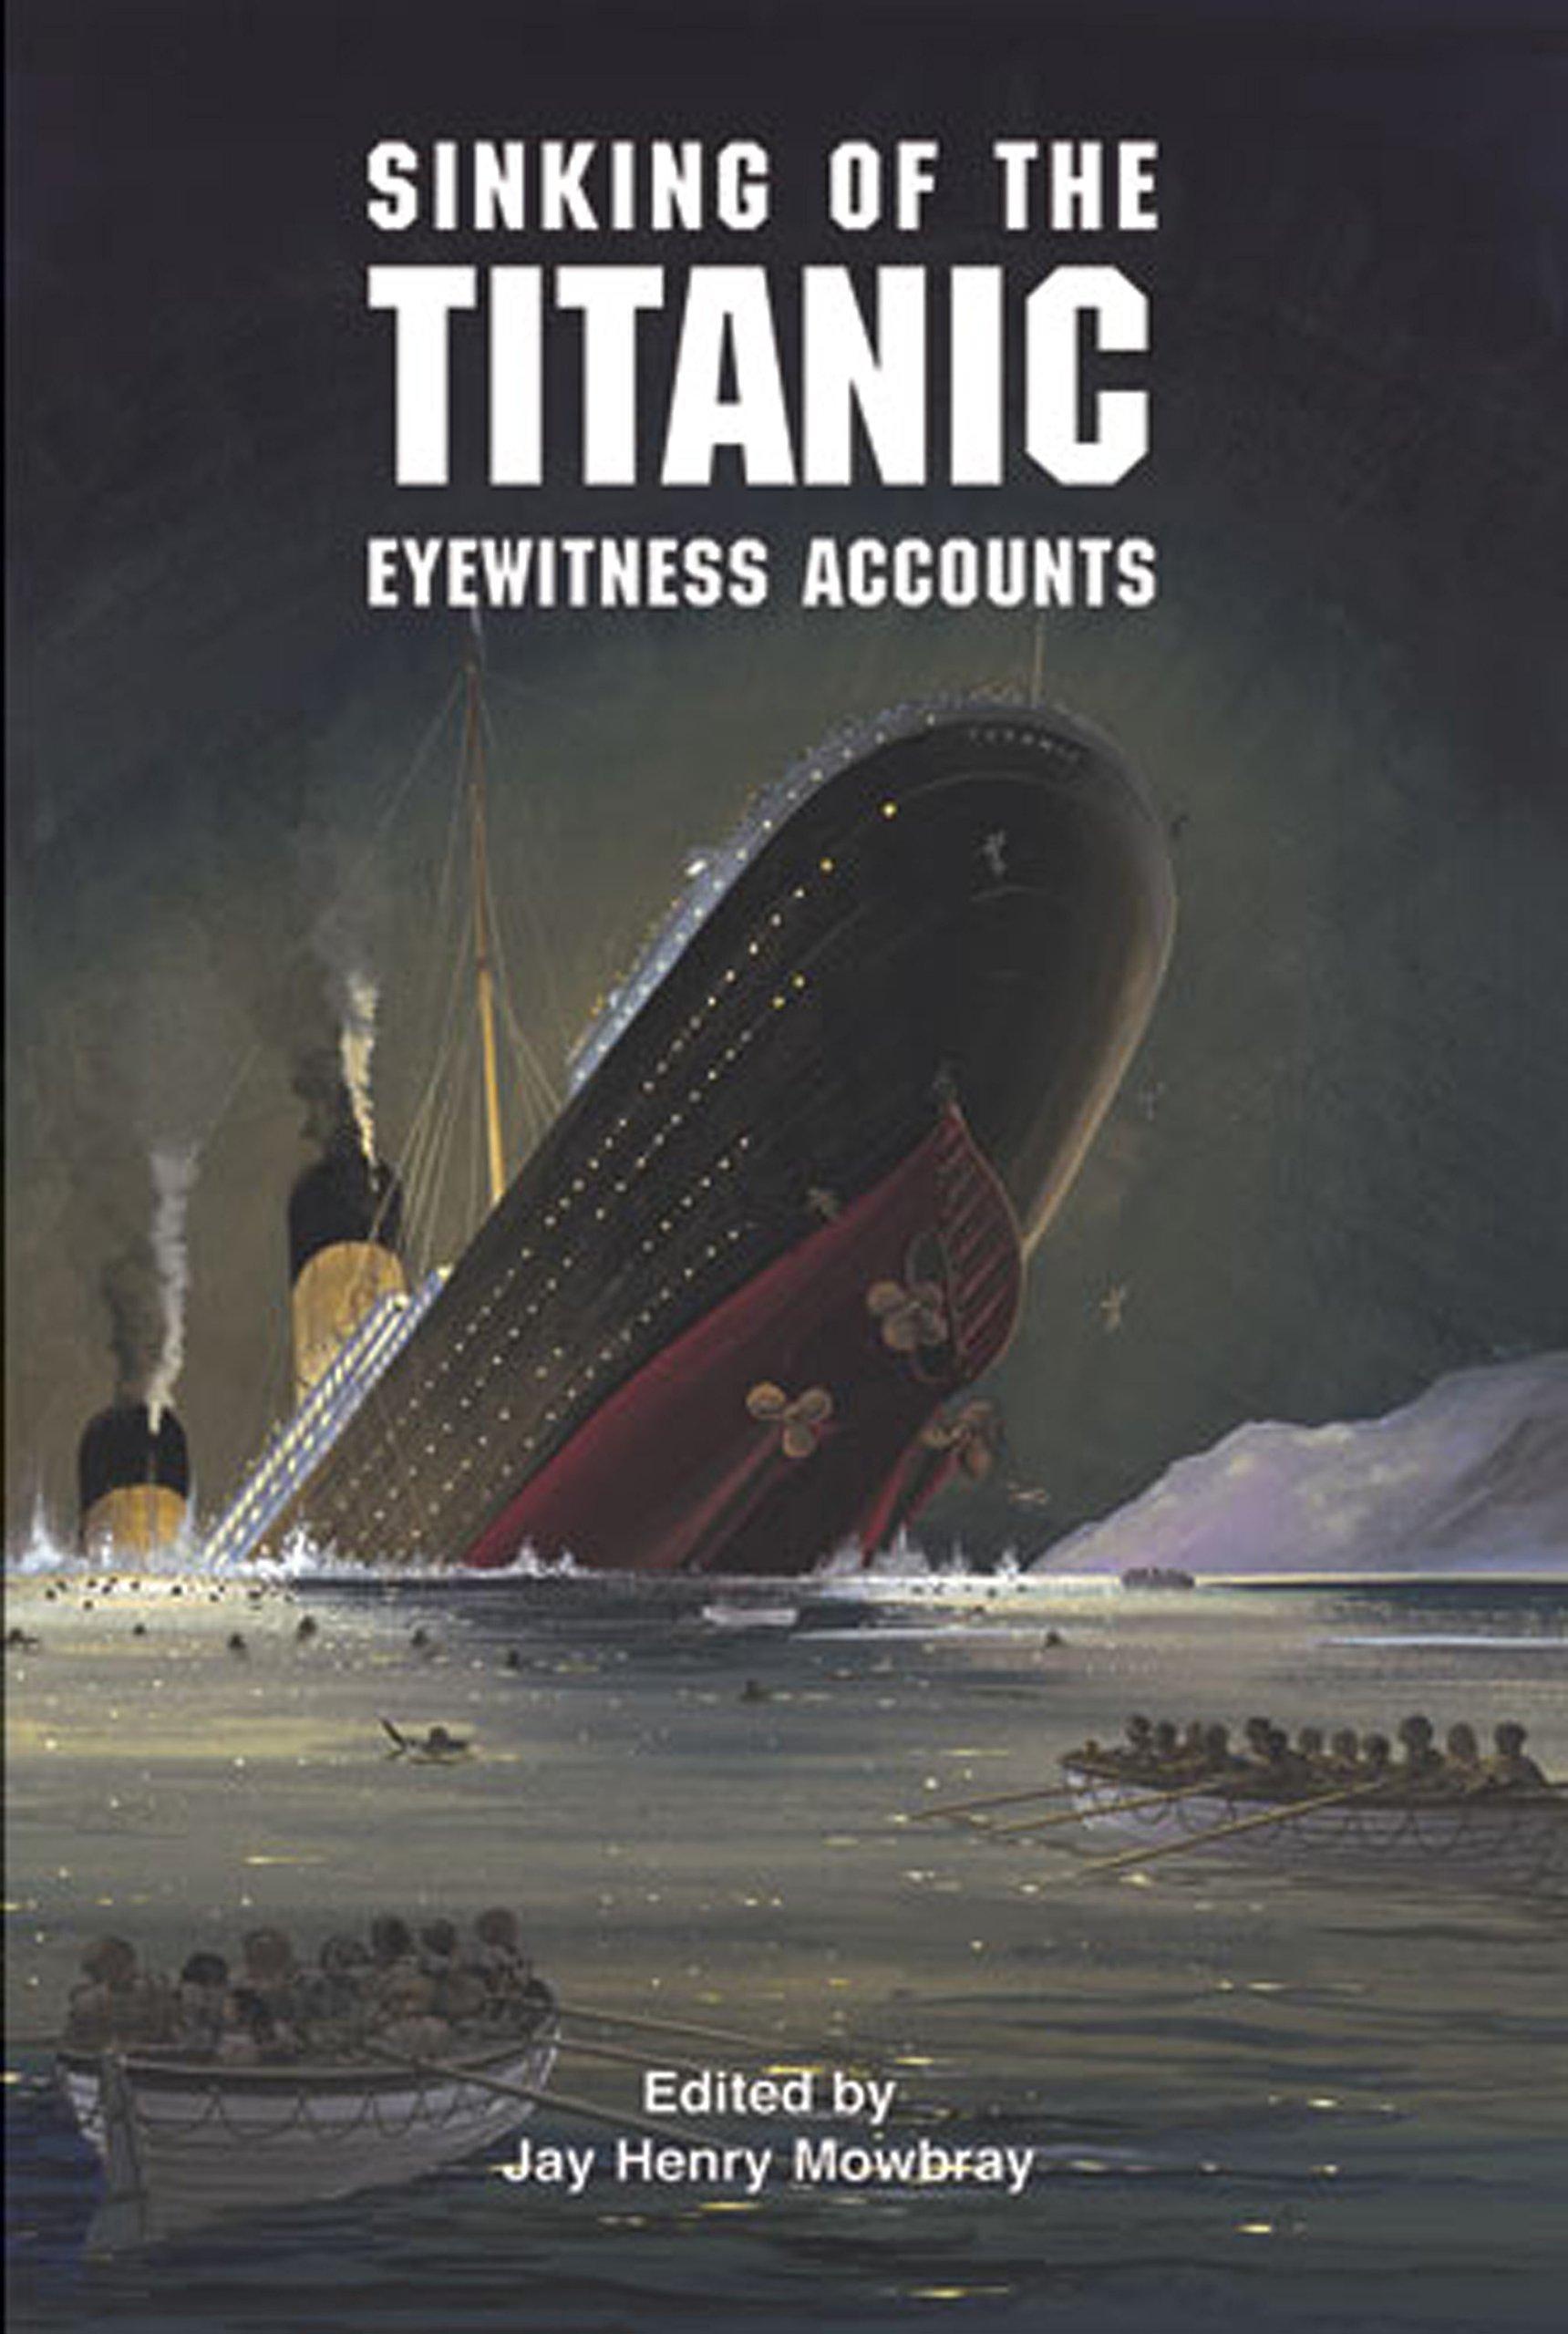 Sinking of the Titanic: Eyewitness Accounts (Dover Maritime)